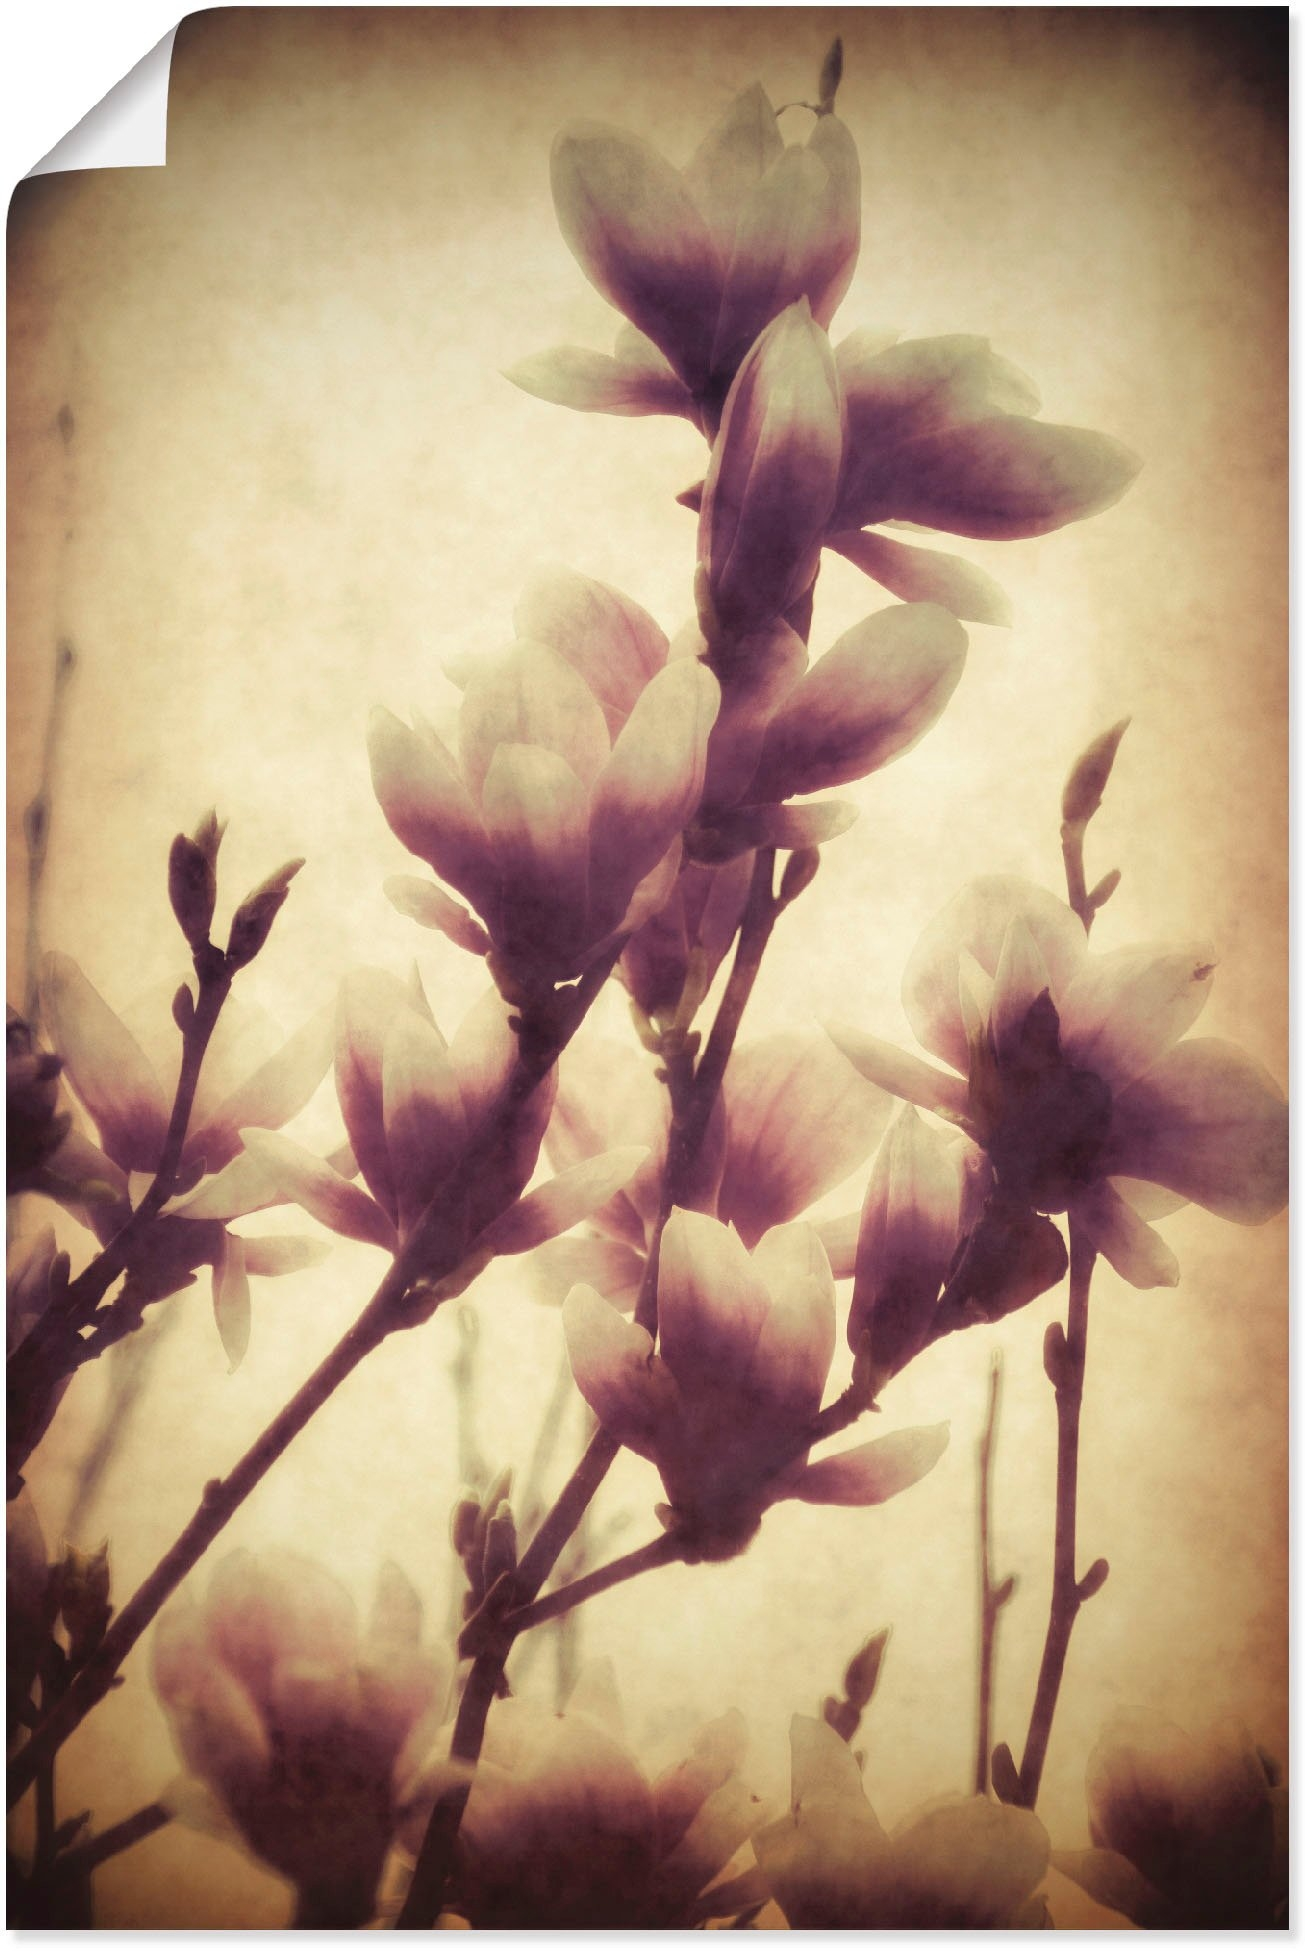 Artland artprint »Magnolia I« veilig op otto.nl kopen